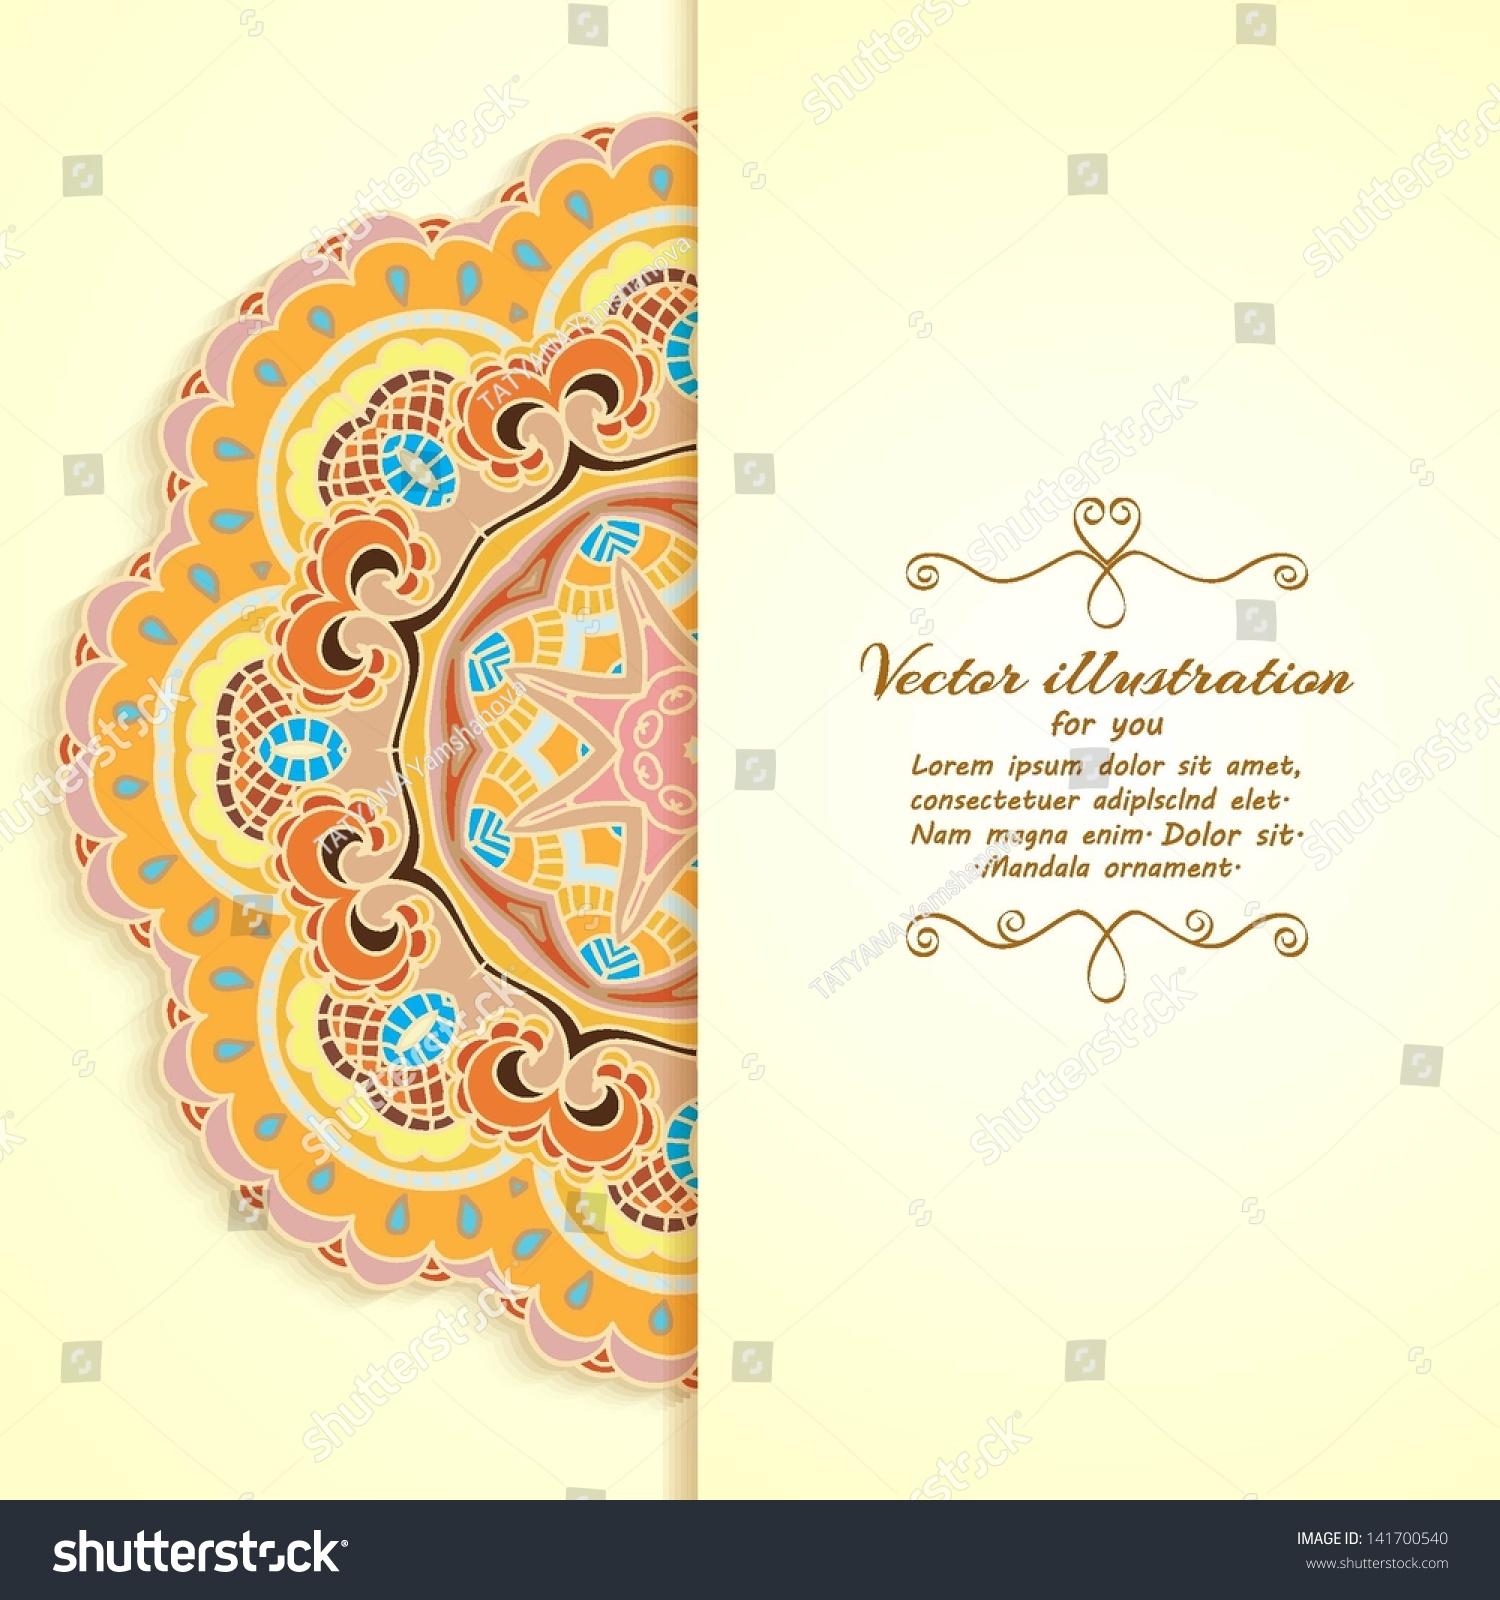 Wedding Card Background Clipart. Wedding. Inspiring wedding card ...